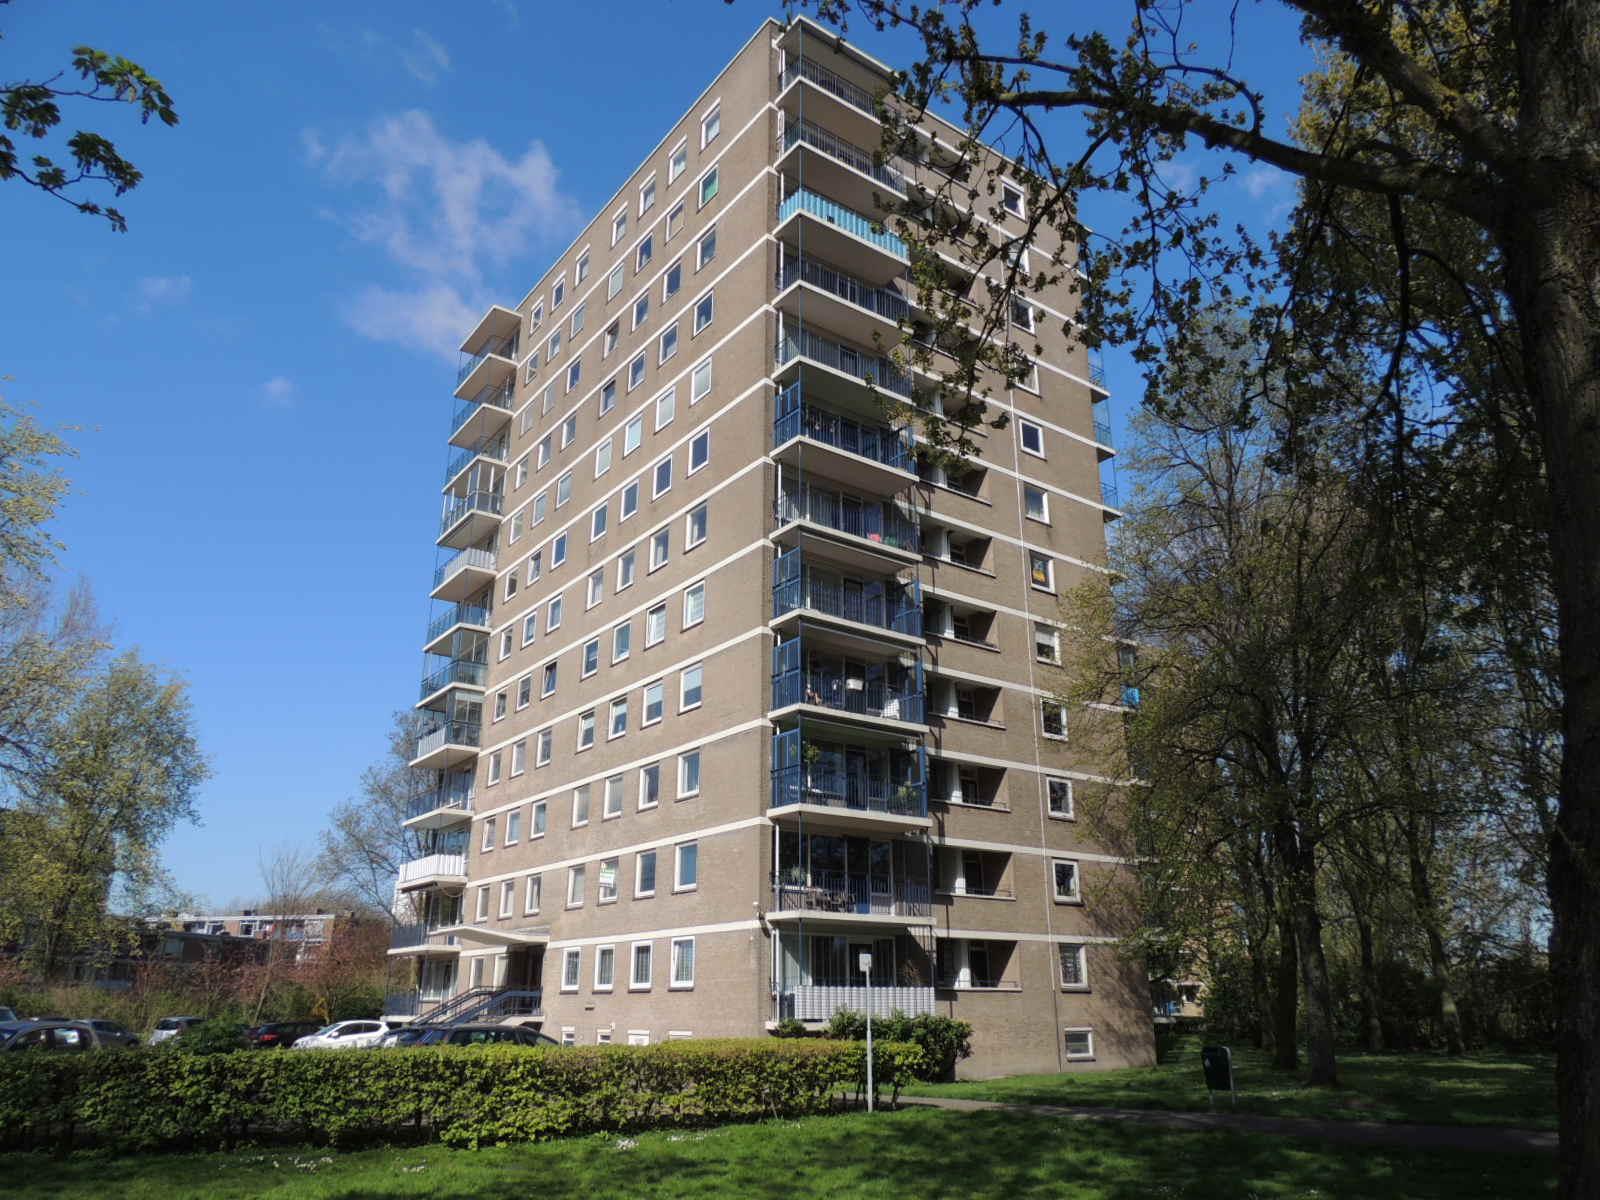 Denenburg 2Br/Furnished/NEW!, The Hague